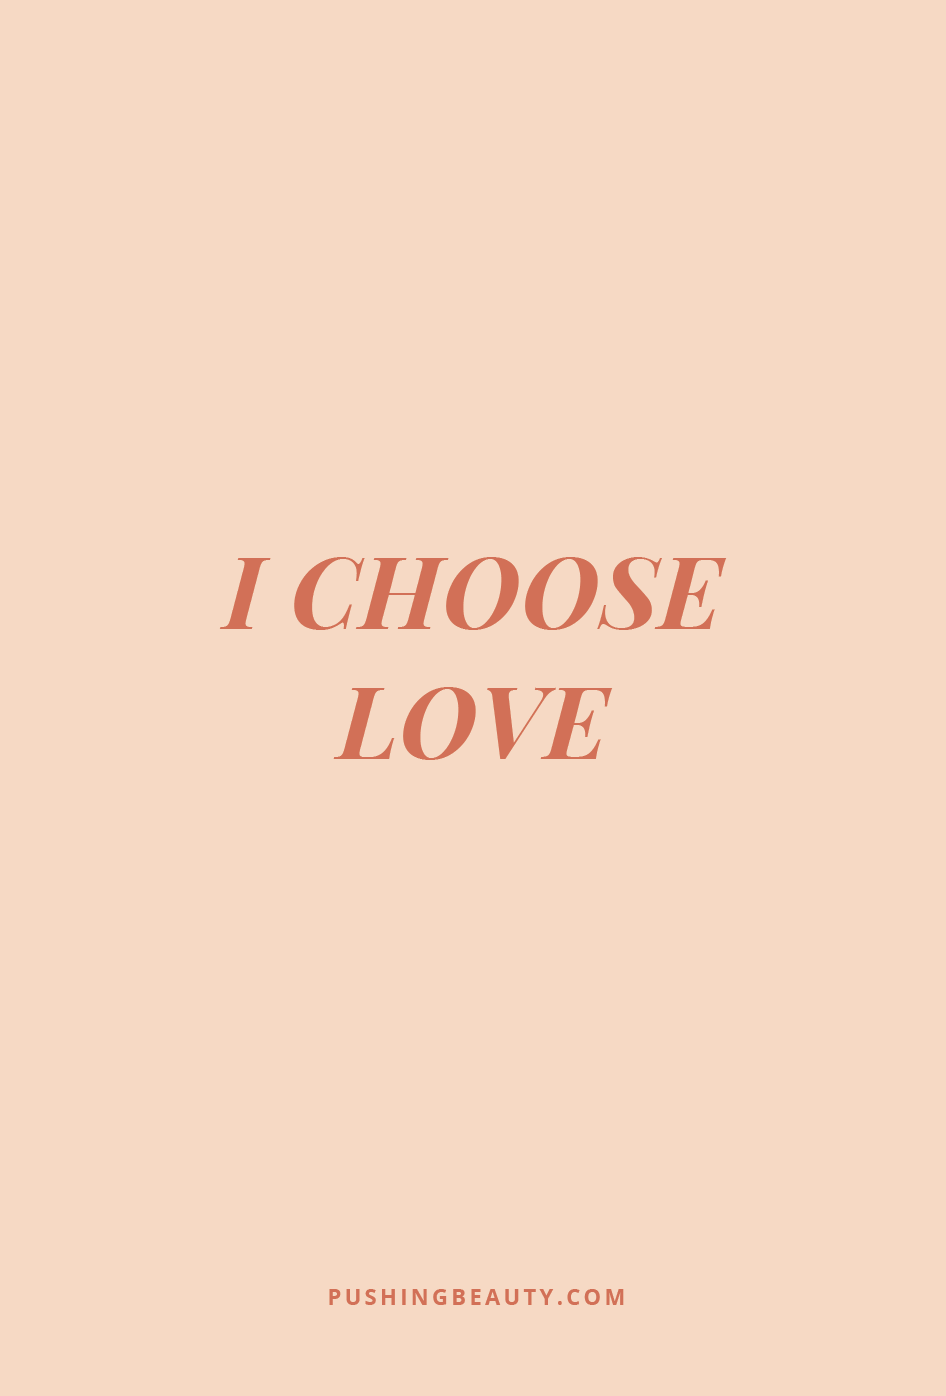 CHOOSE-LOVE.png